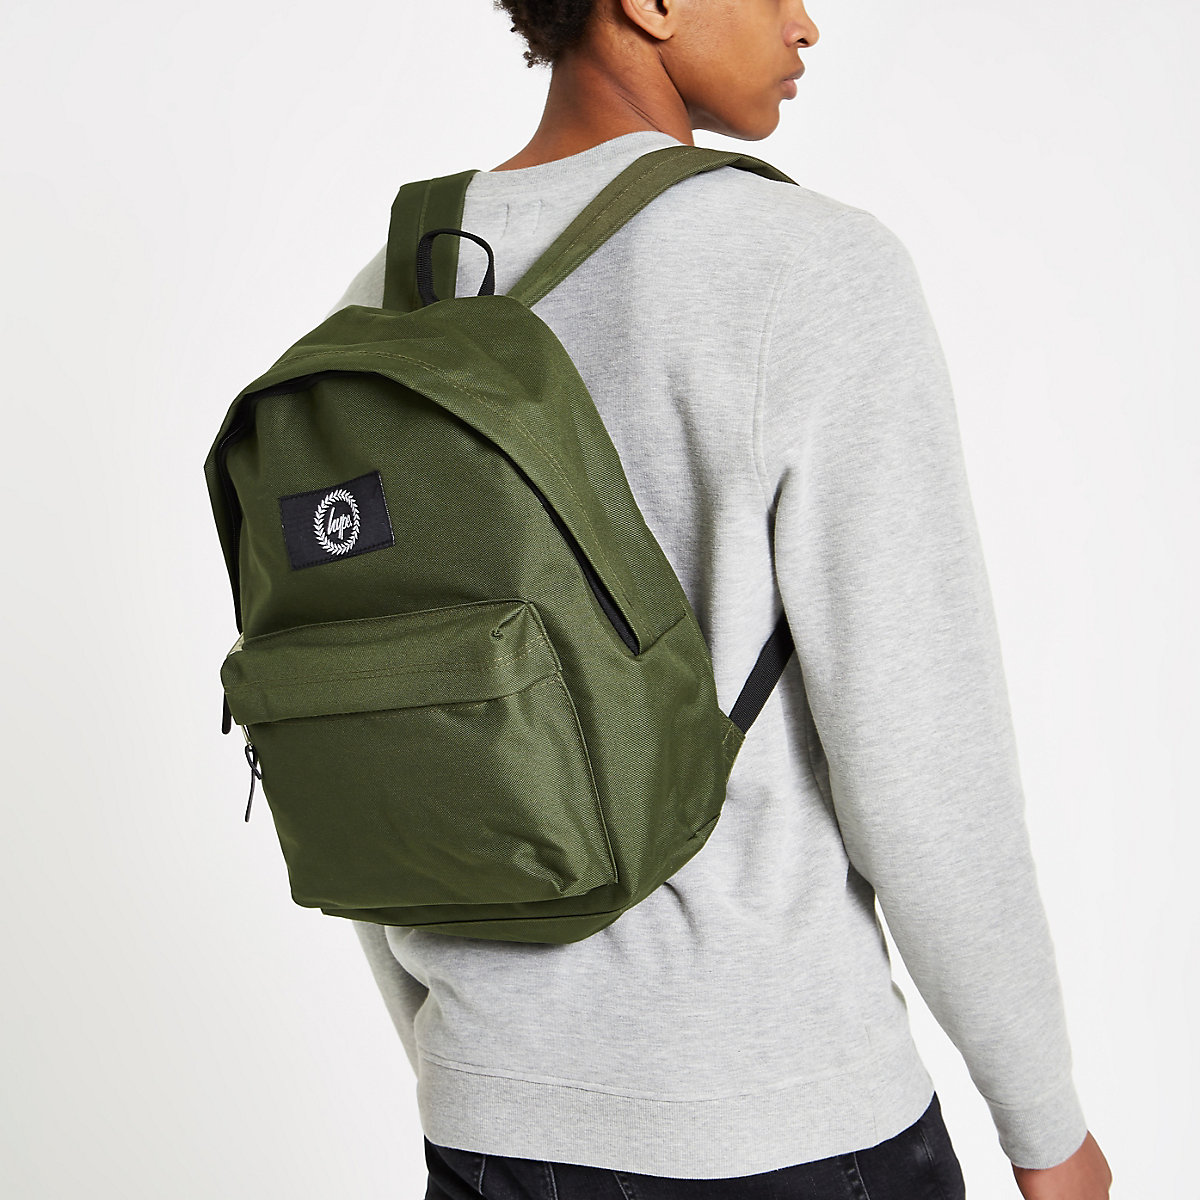 477cbabb4f75 Hype khaki green embroidered backpack - Backpacks   Rucksacks - Bags ...